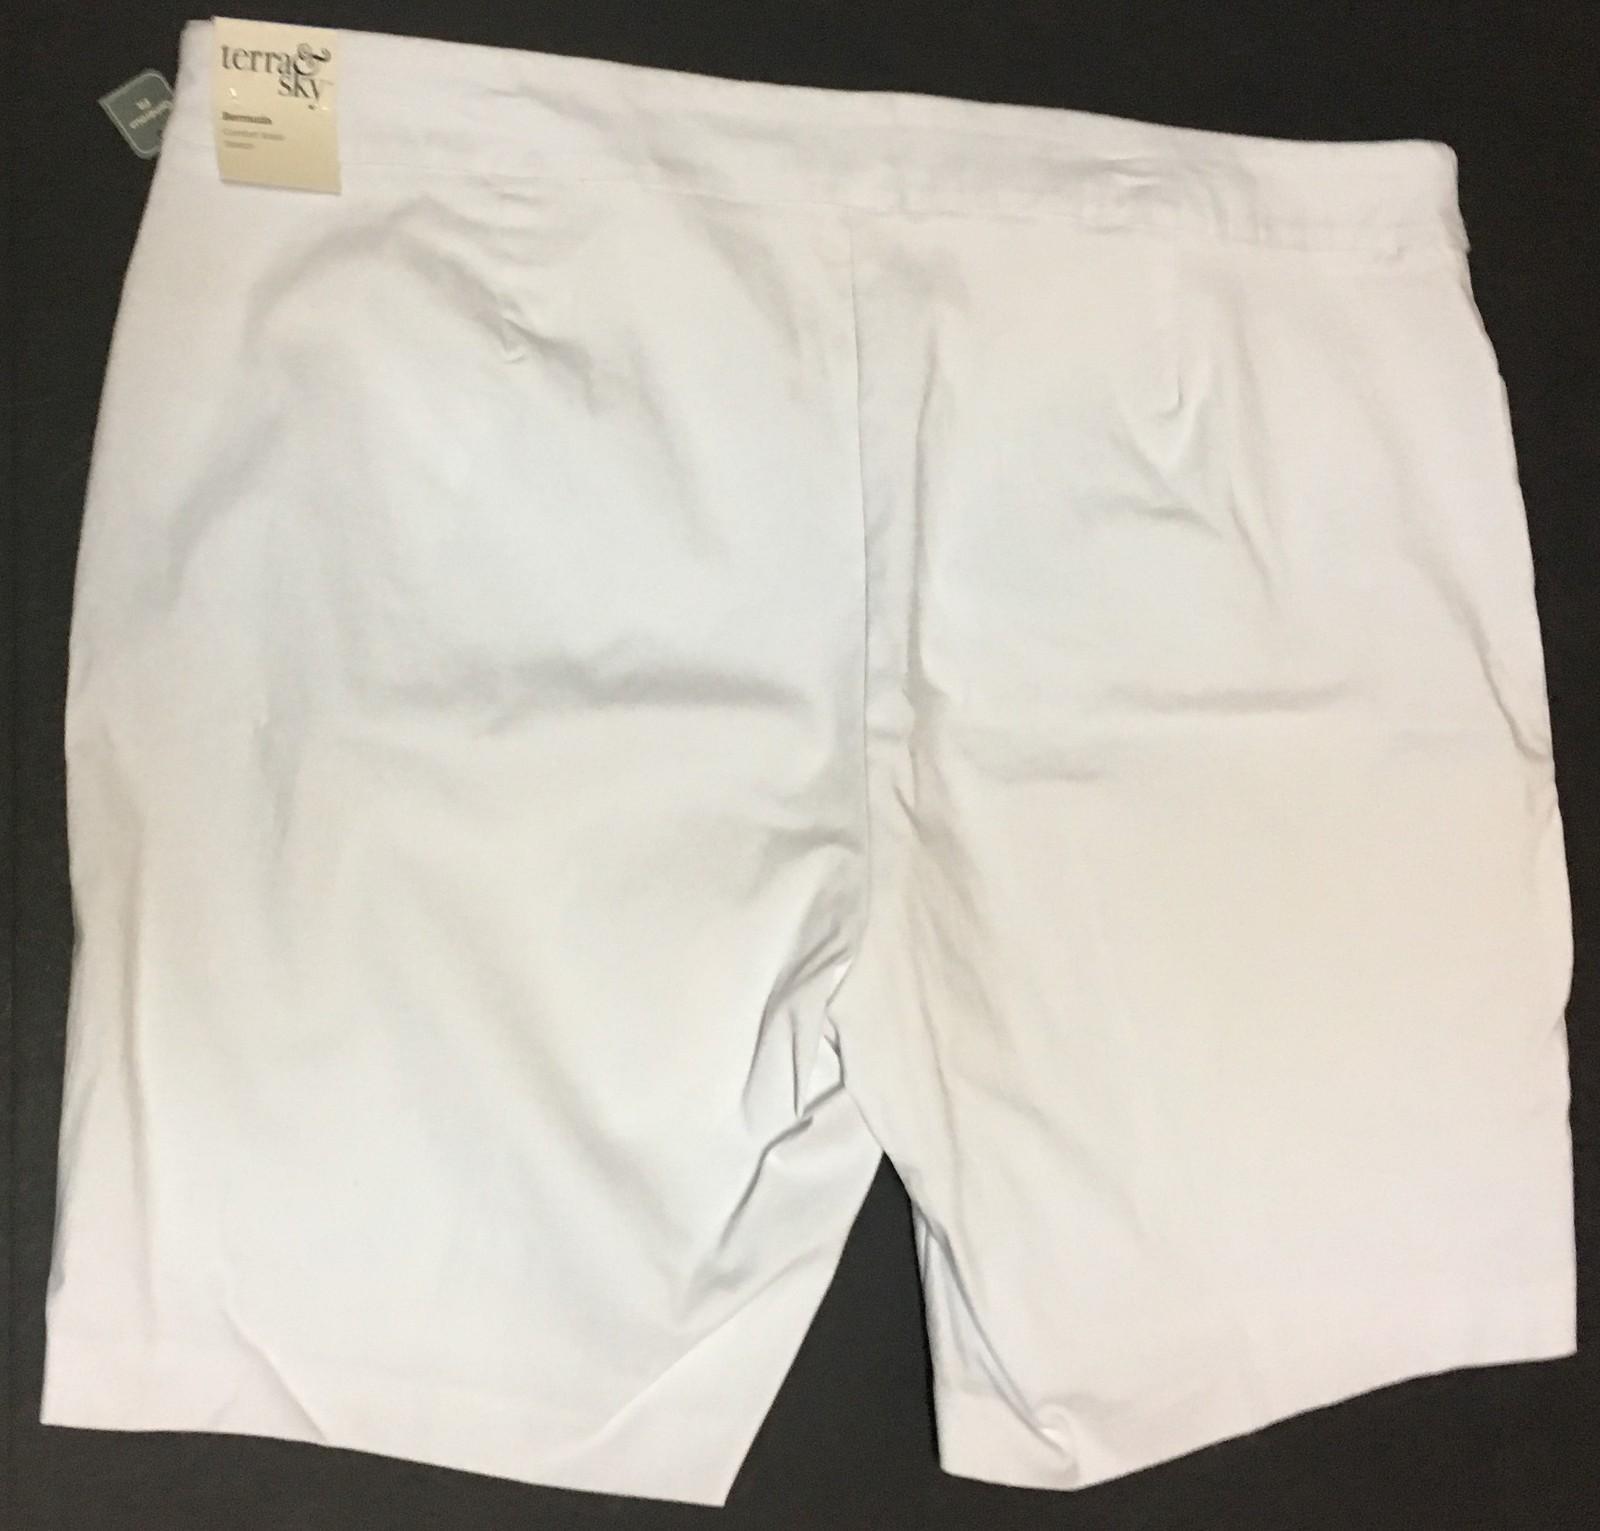 Terra & Sky White Shorts Comfort Waist Stretch Bermuda 2X (20-22W) NWT